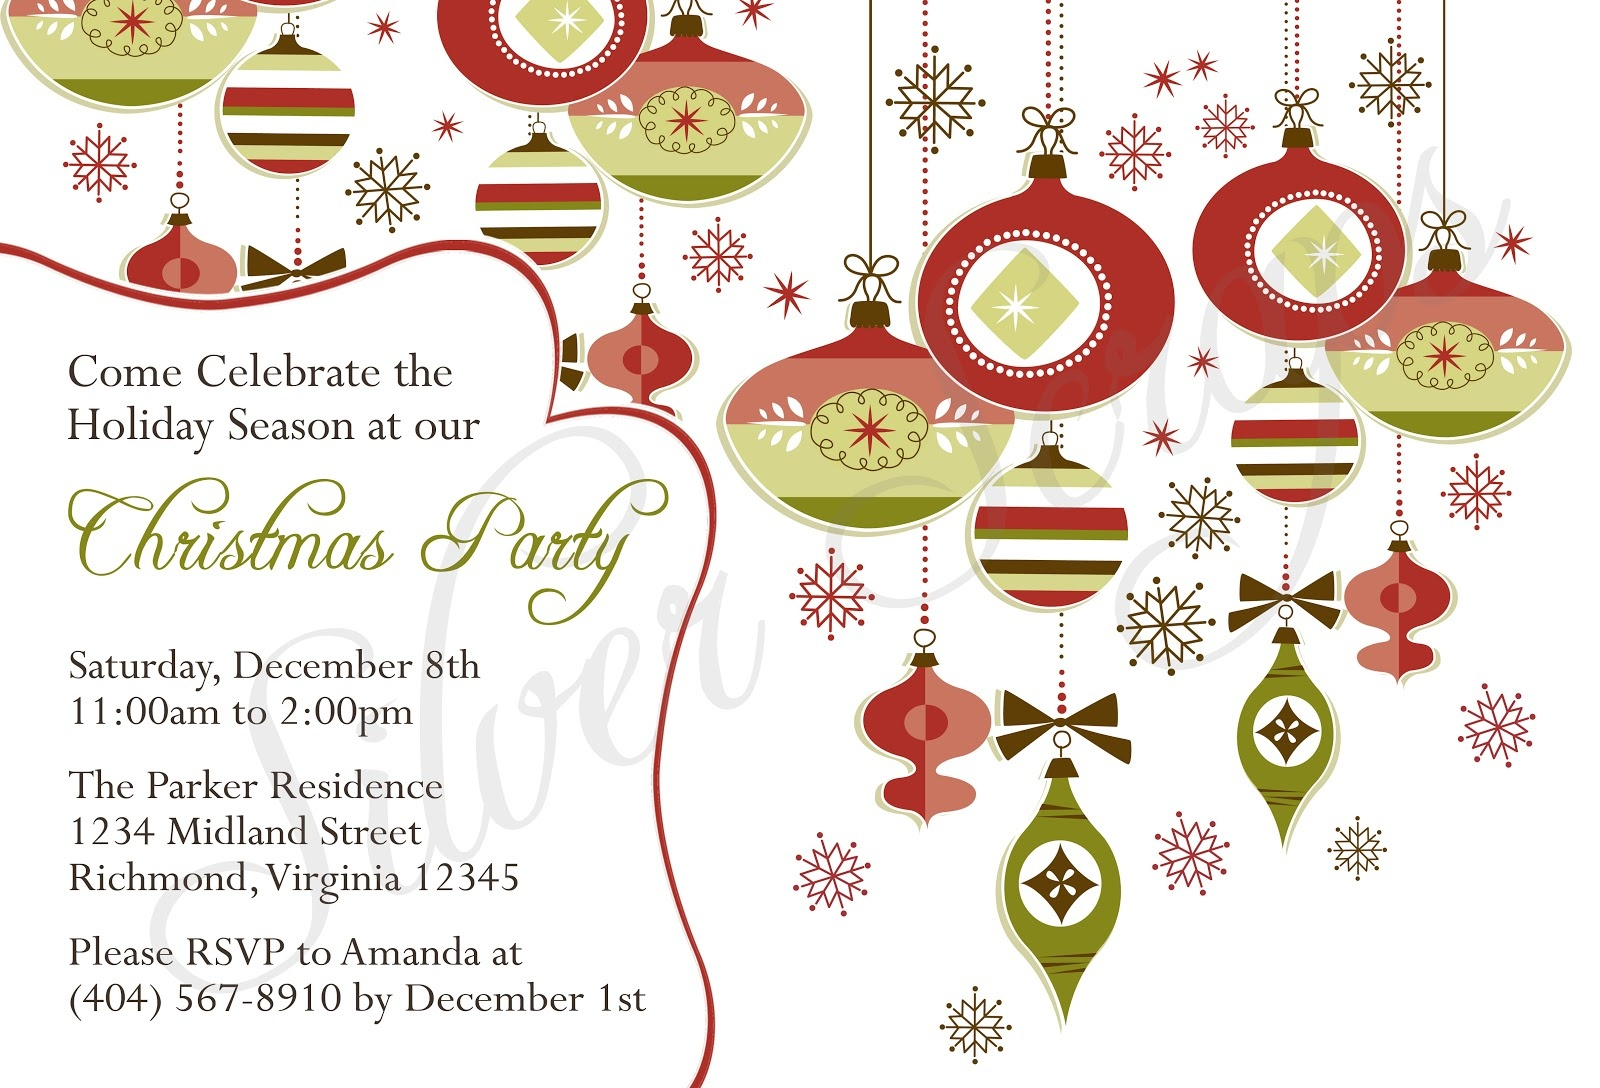 Printable Religious Invitations - Free Printable Religious Christmas Invitations